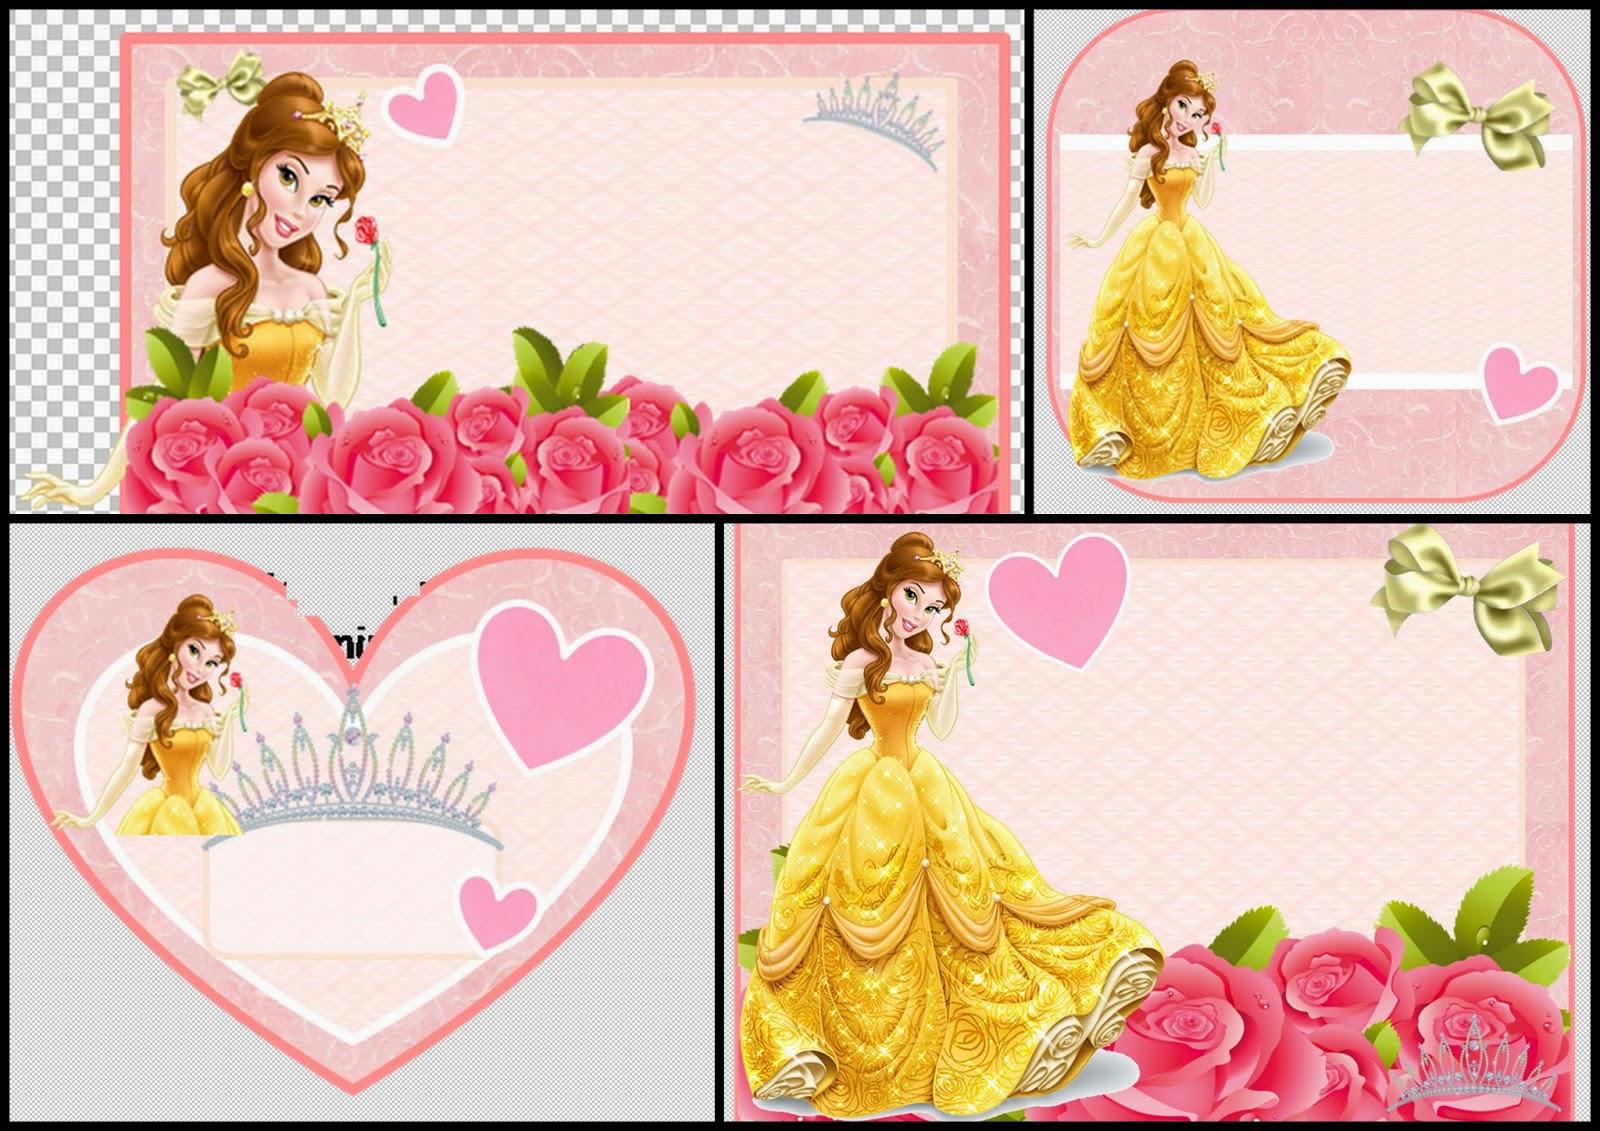 Disney belle background frame clipart clipart freeuse stock Belle Free Printable Invitations, Cards or Photo Frames. | Is it ... clipart freeuse stock